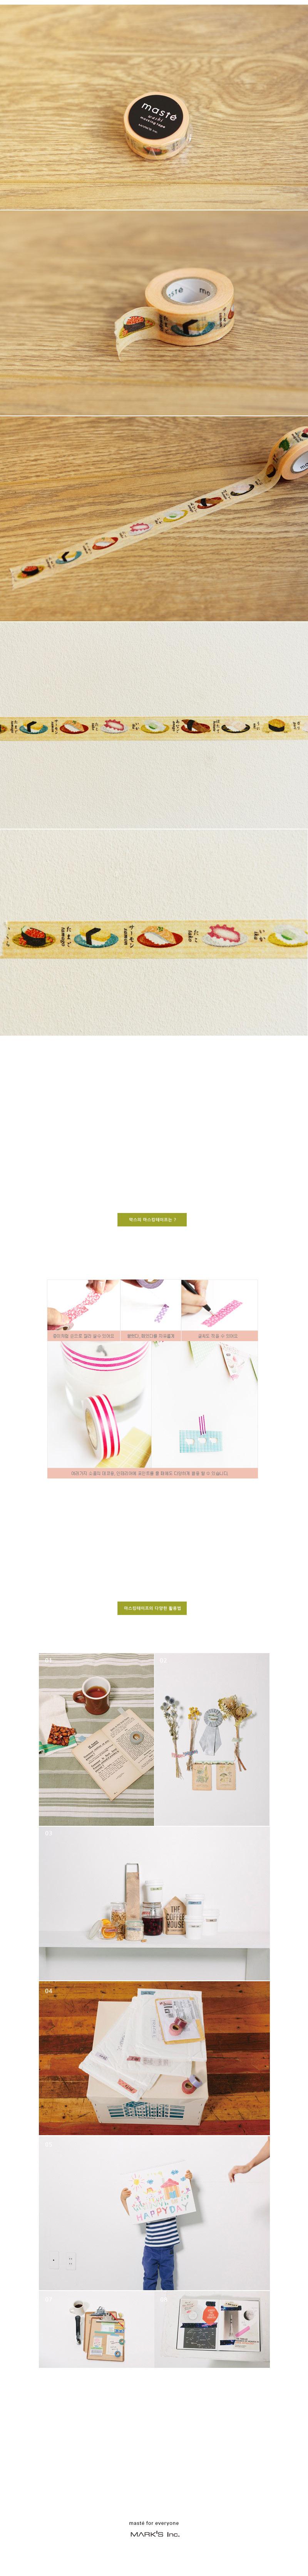 cute unique stationery [cute stationery, unique stationery, cute stationary]